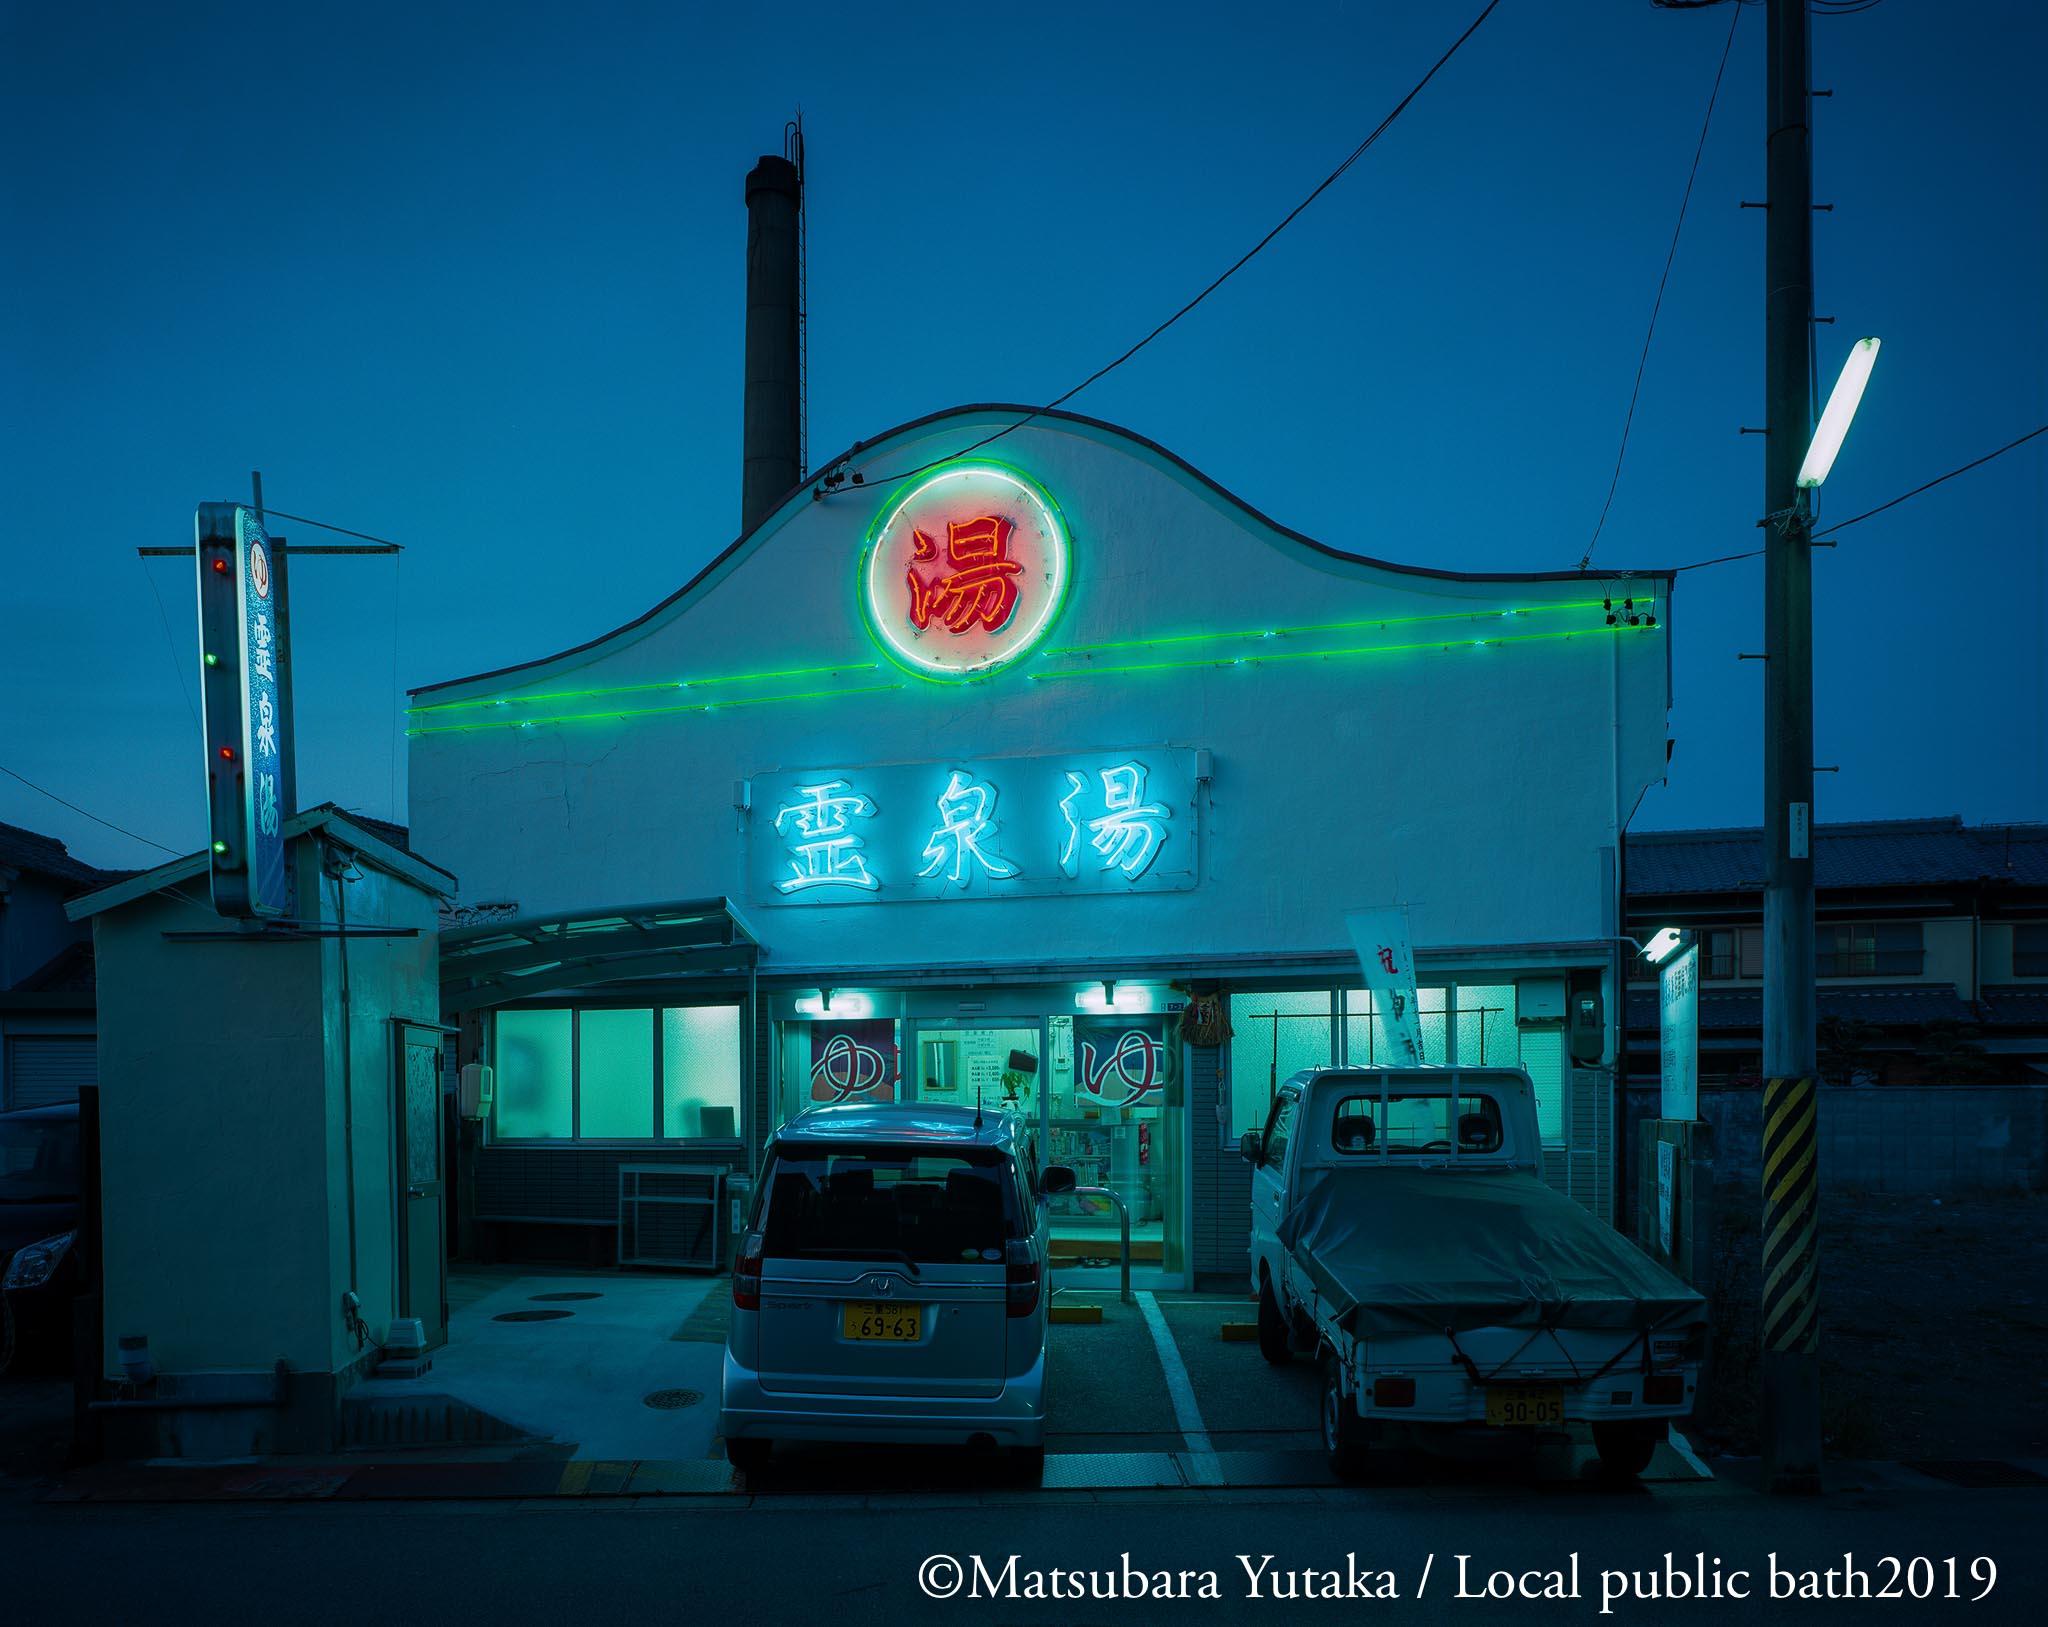 LocalpublicbathReisenyu Japn-IseCity